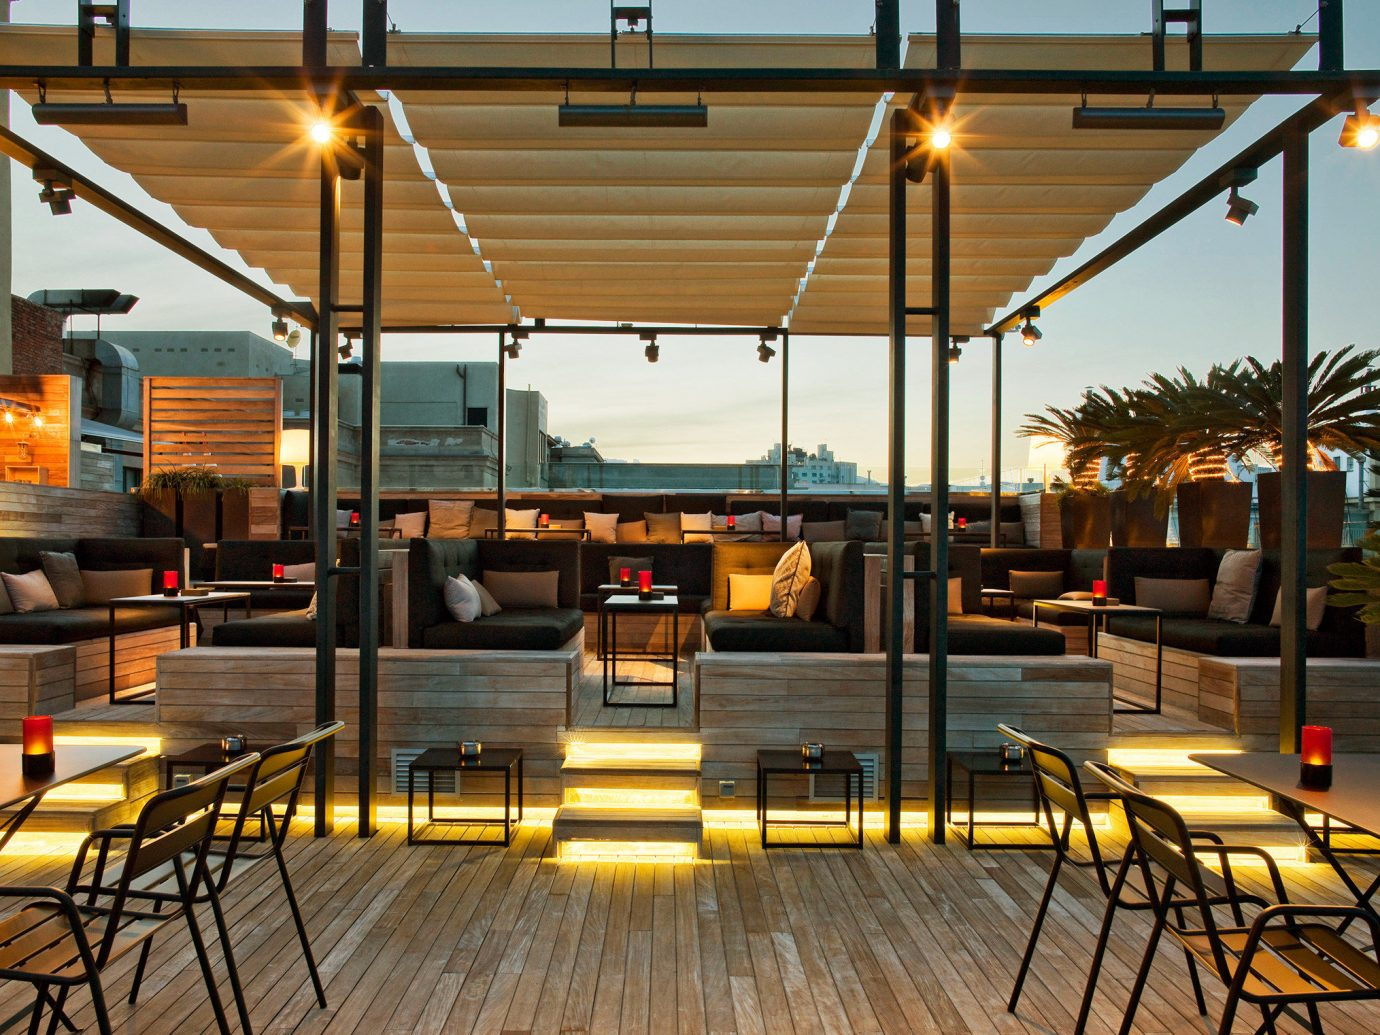 Bar Boutique Hotels Dining Drink Eat Hotels Luxury Nightlife Romantic sky restaurant plaza interior design lighting Design Lobby meal